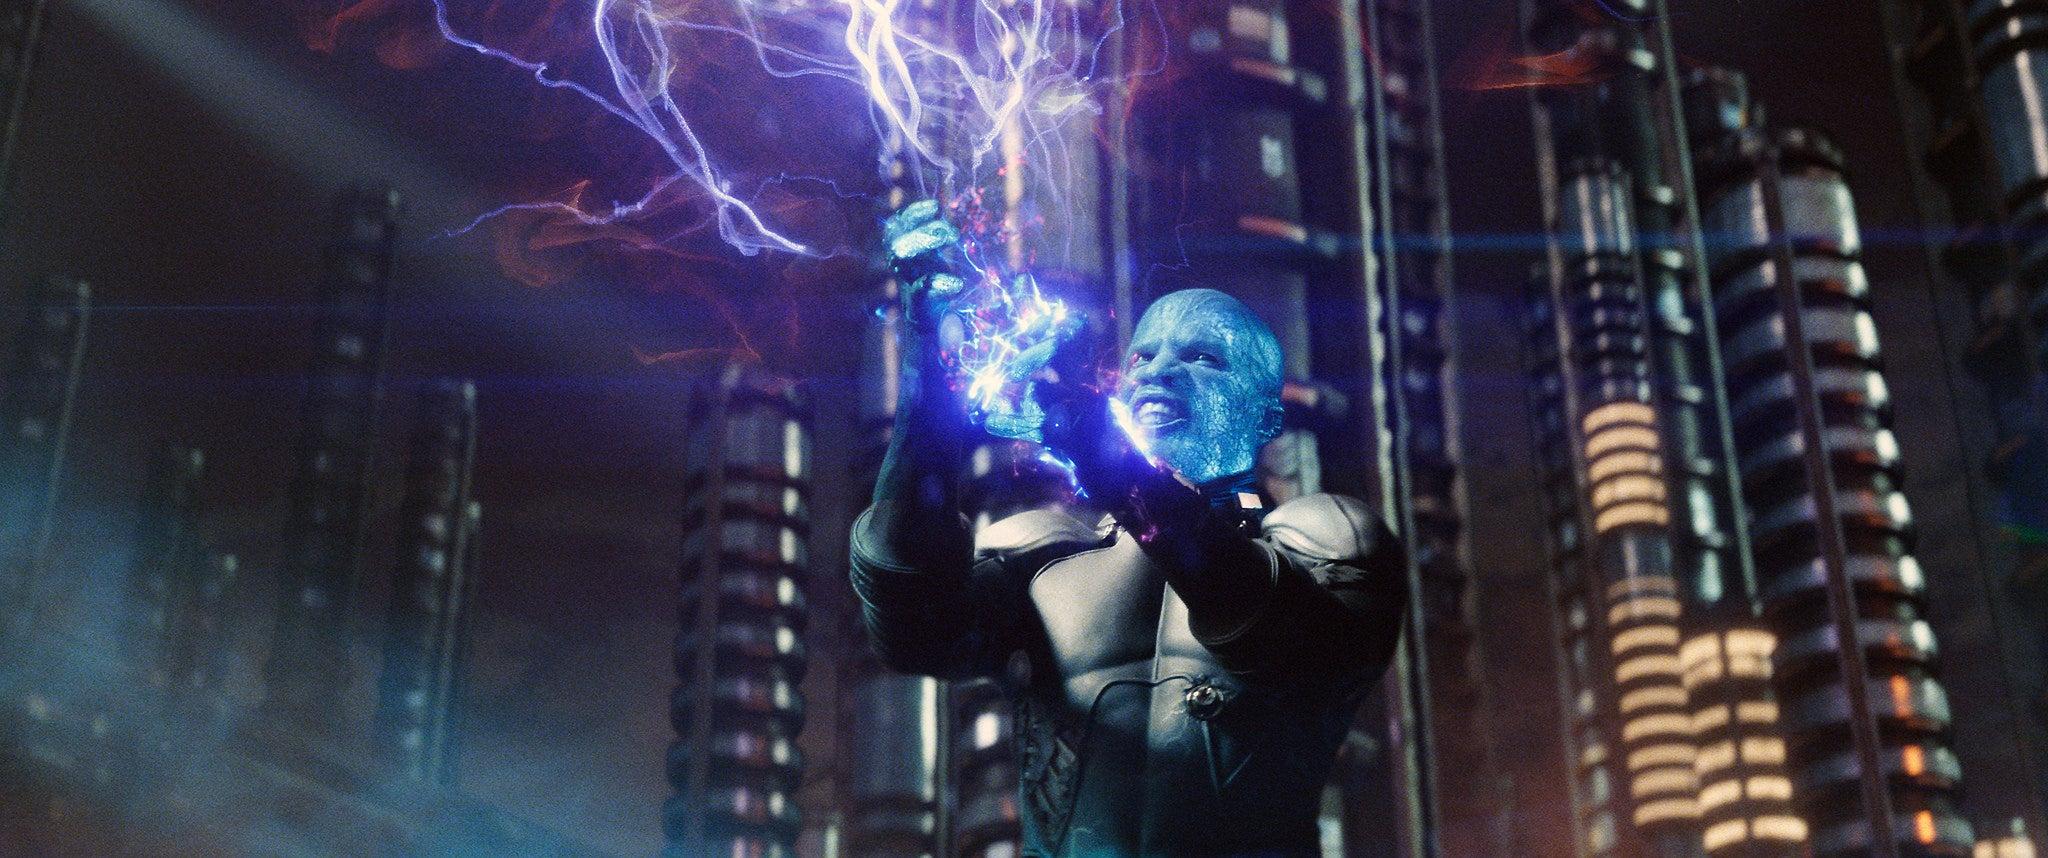 the-amazing-spider-man-2-electro-hi-rez